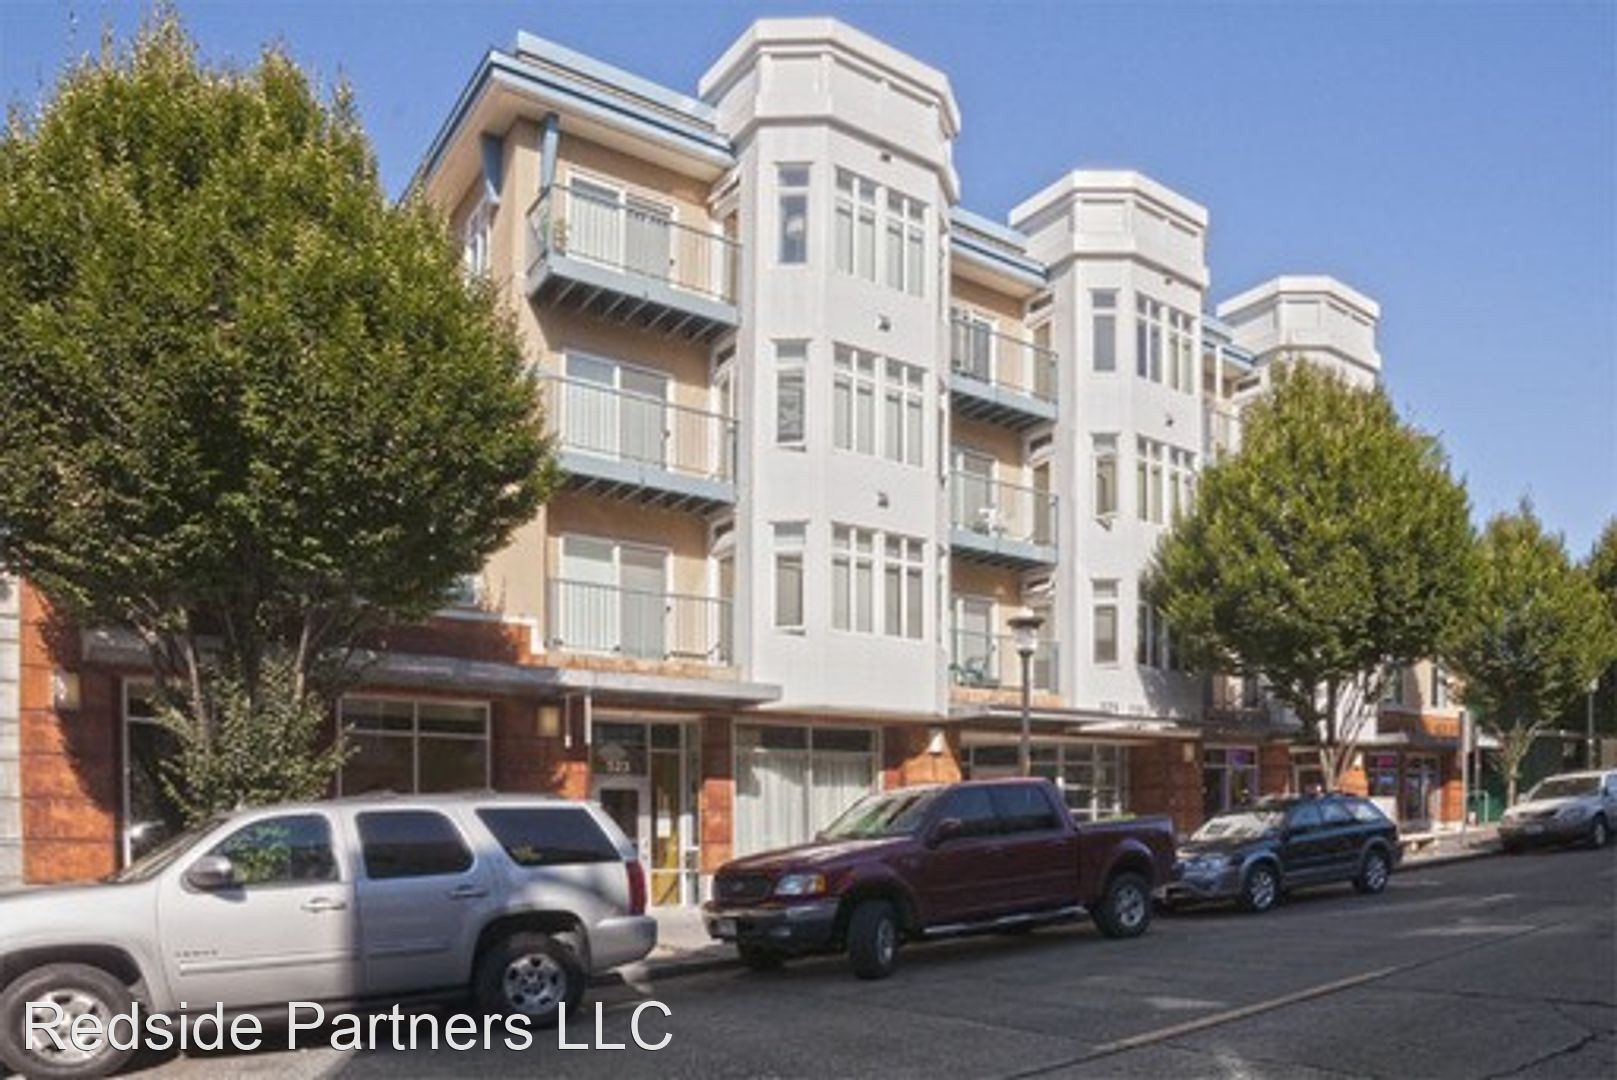 Apartments Near UW 525 1st Ave West for University of Washington Students in Seattle, WA